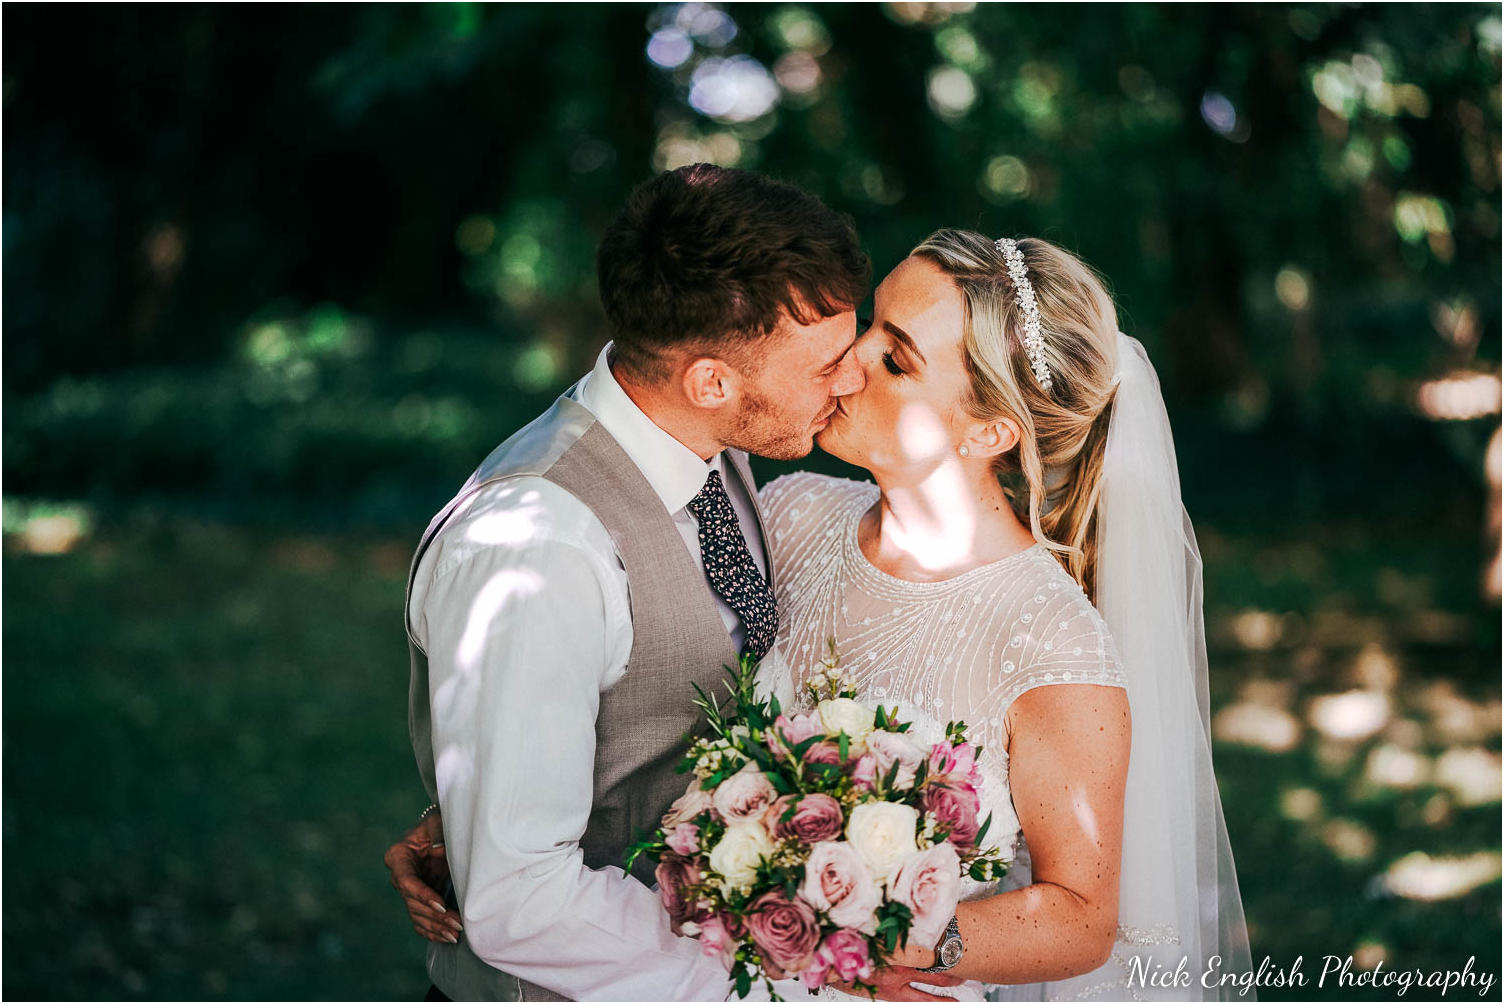 Mitton_Hall_Wedding_Photograph-141.jpg